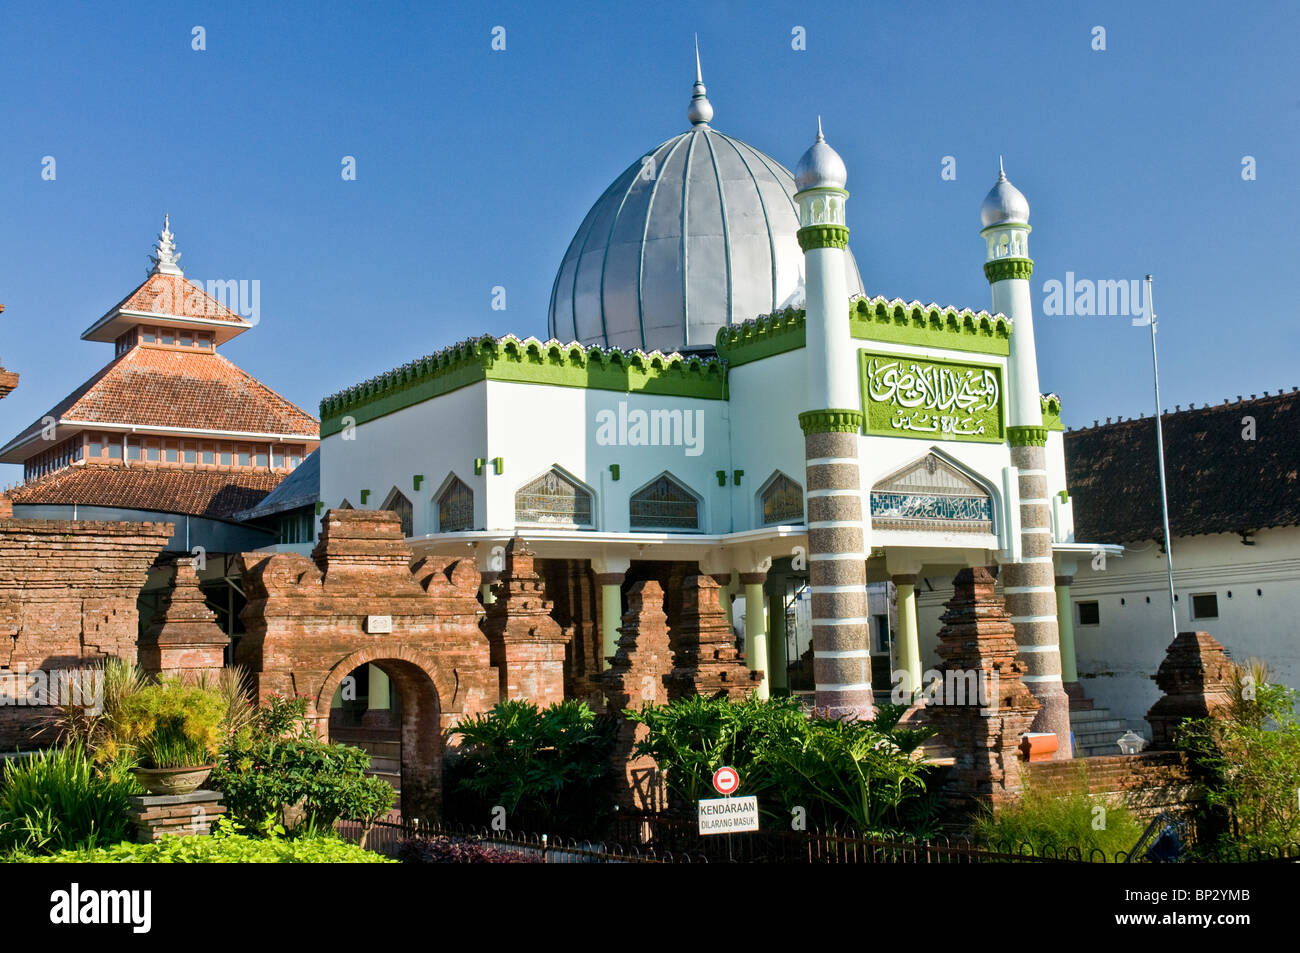 Masjid Menara Kudus at Central Java Island, Indonesia - Stock Image